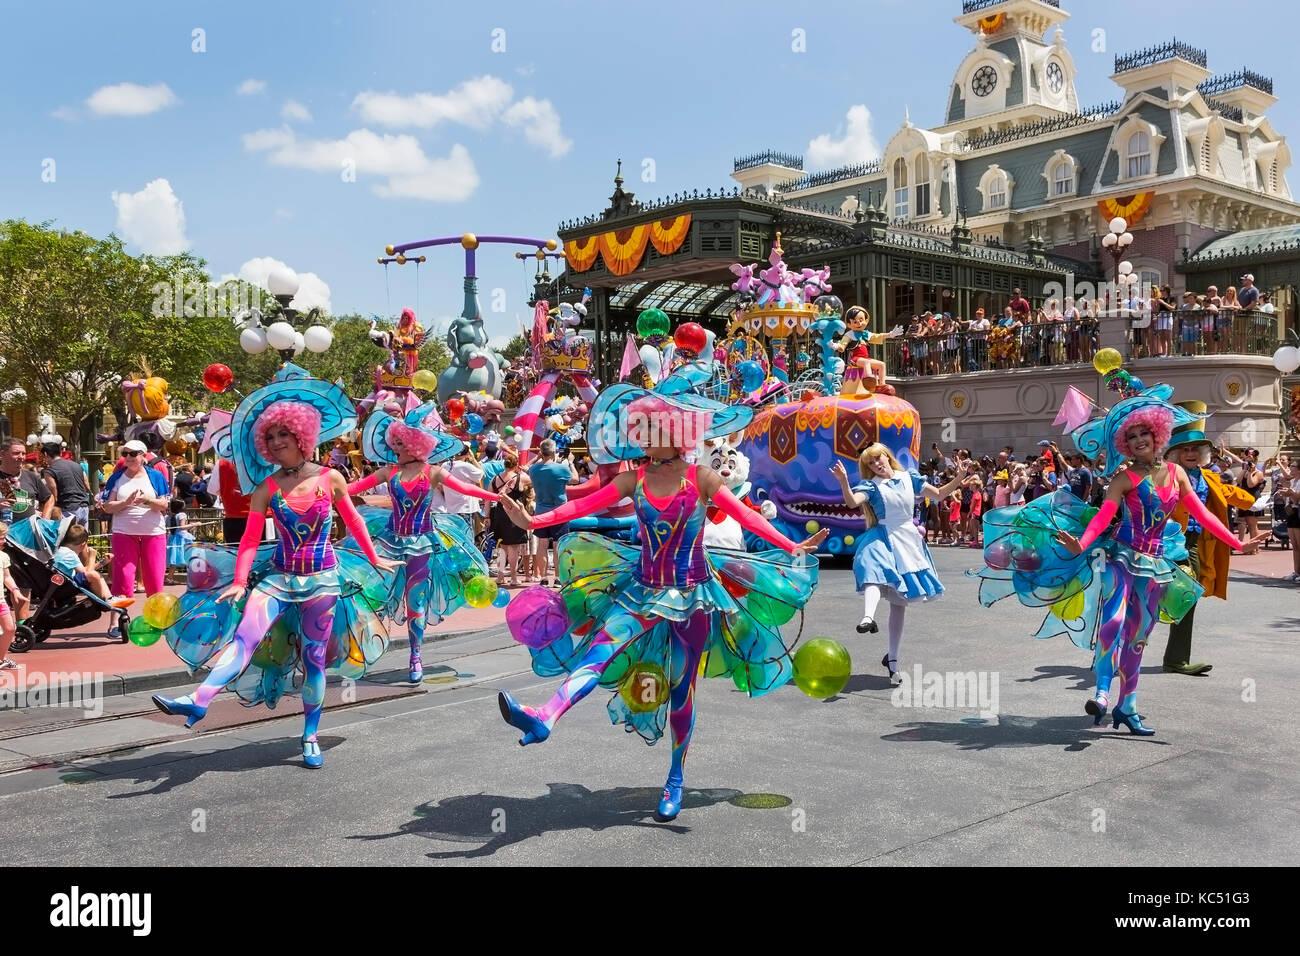 Walt Disney's Magic Kingdom theme park, Orlando, Florida, USA and the fairytale parade 'Carnival of Fantasy' - Stock Image